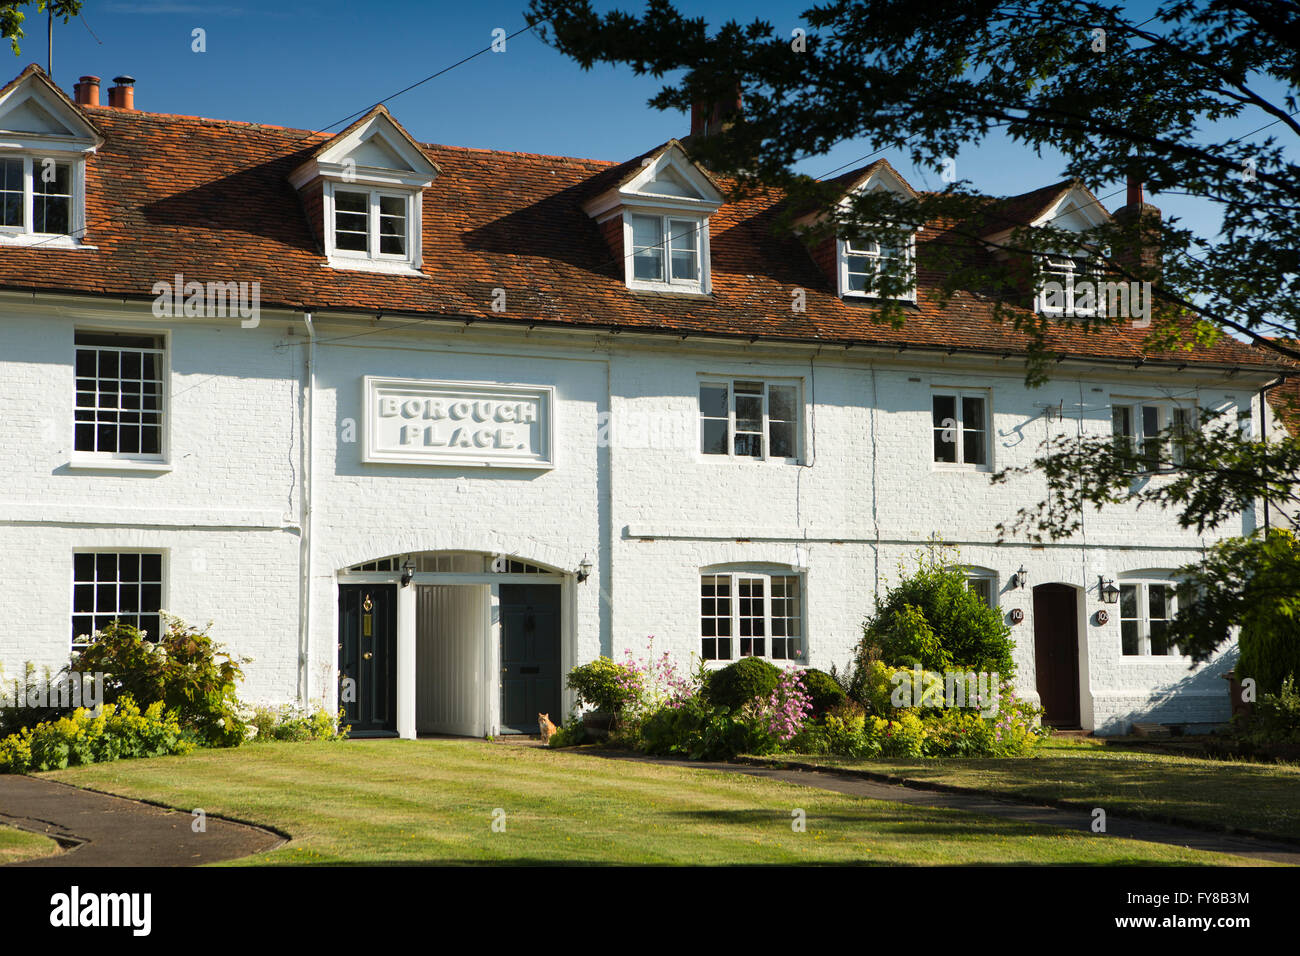 UK, Kent, Tenterden, High Street, Borough Place, former town workhouse - Stock Image